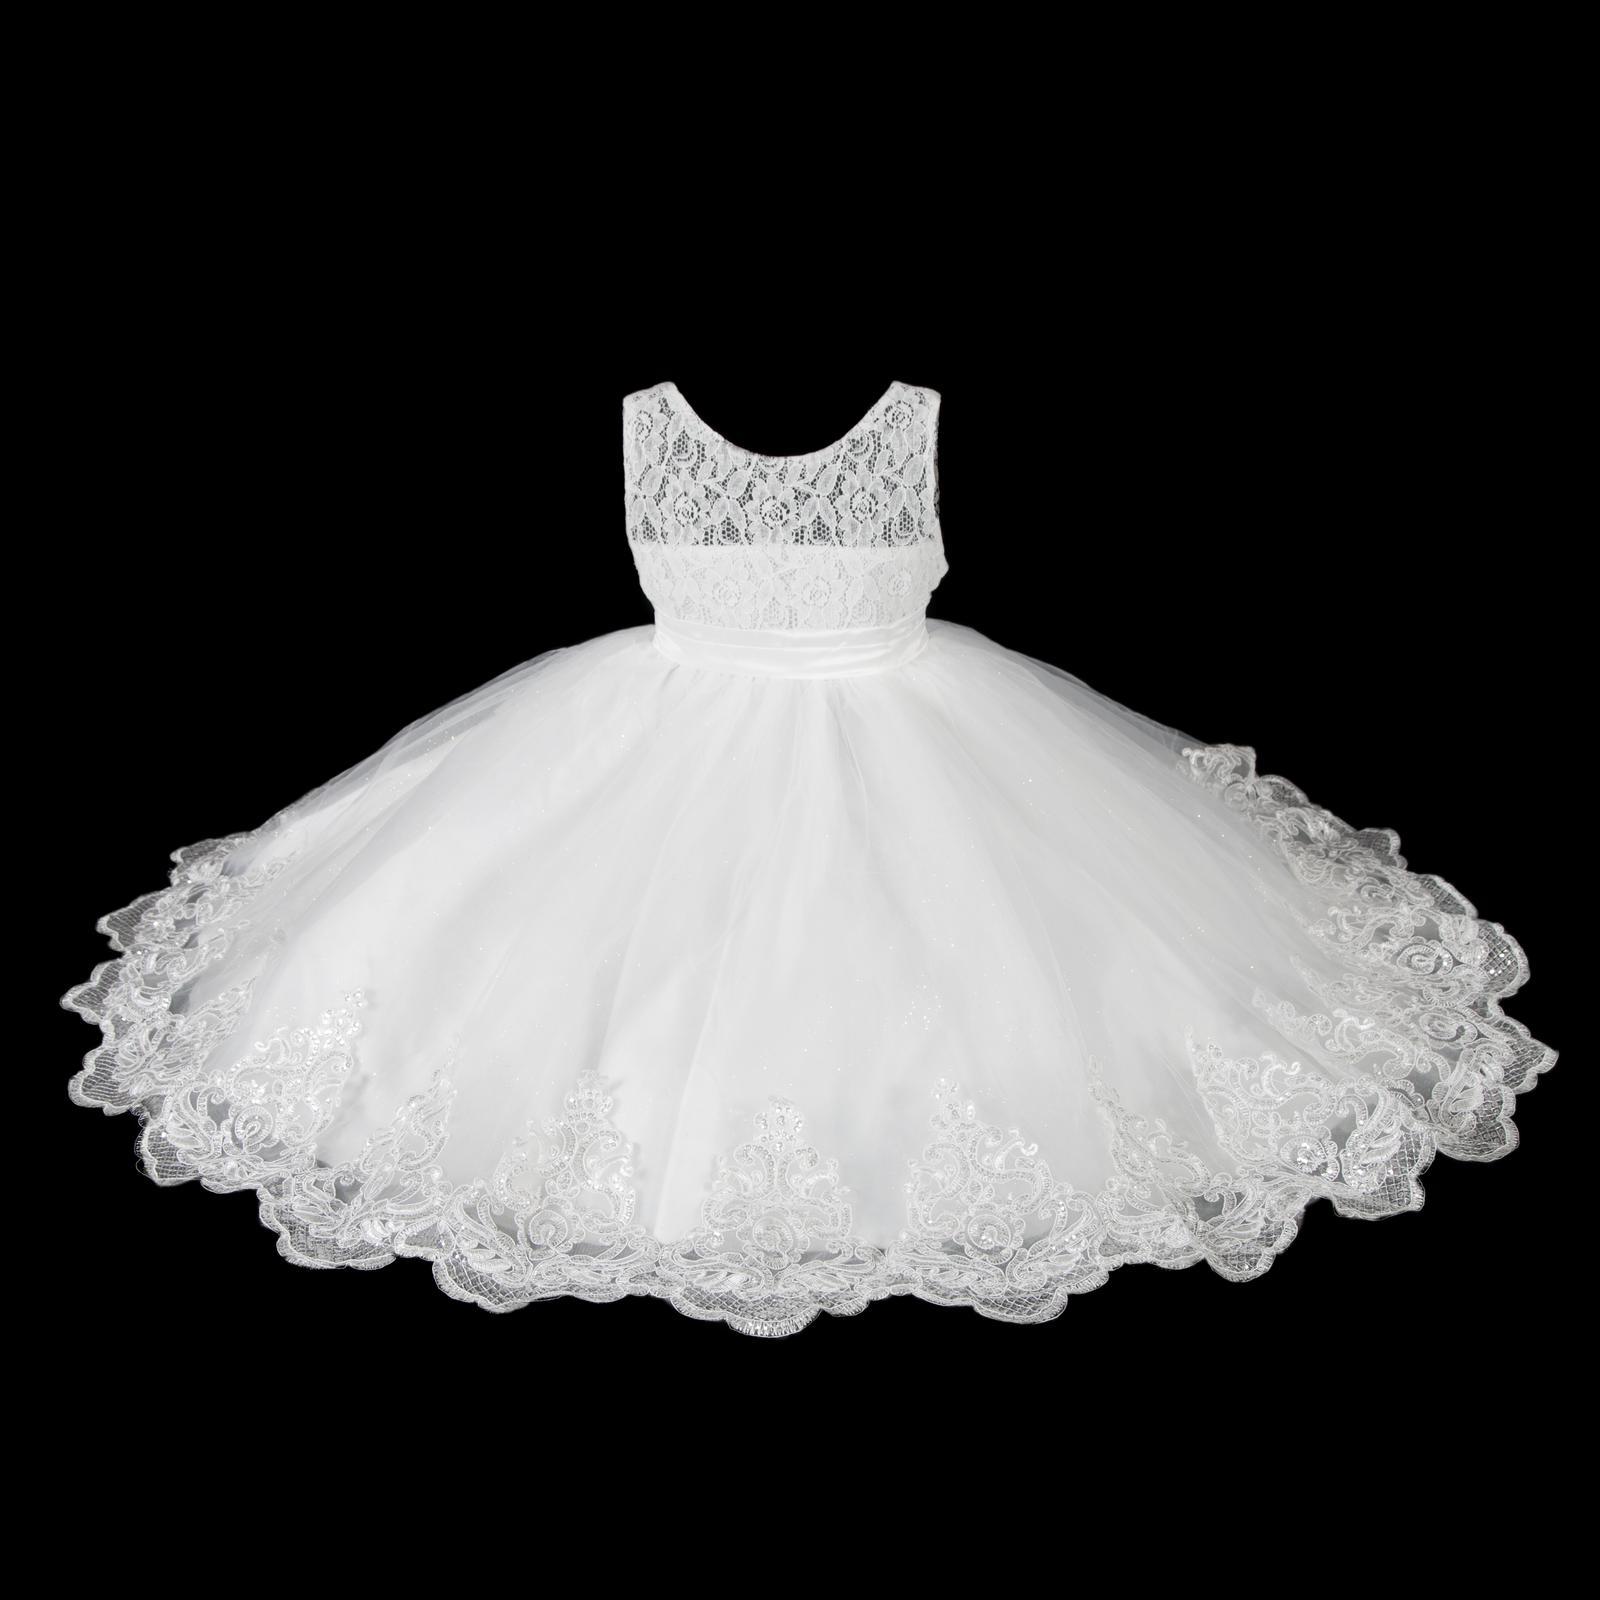 Šaty Isabel - Obrázek č. 2